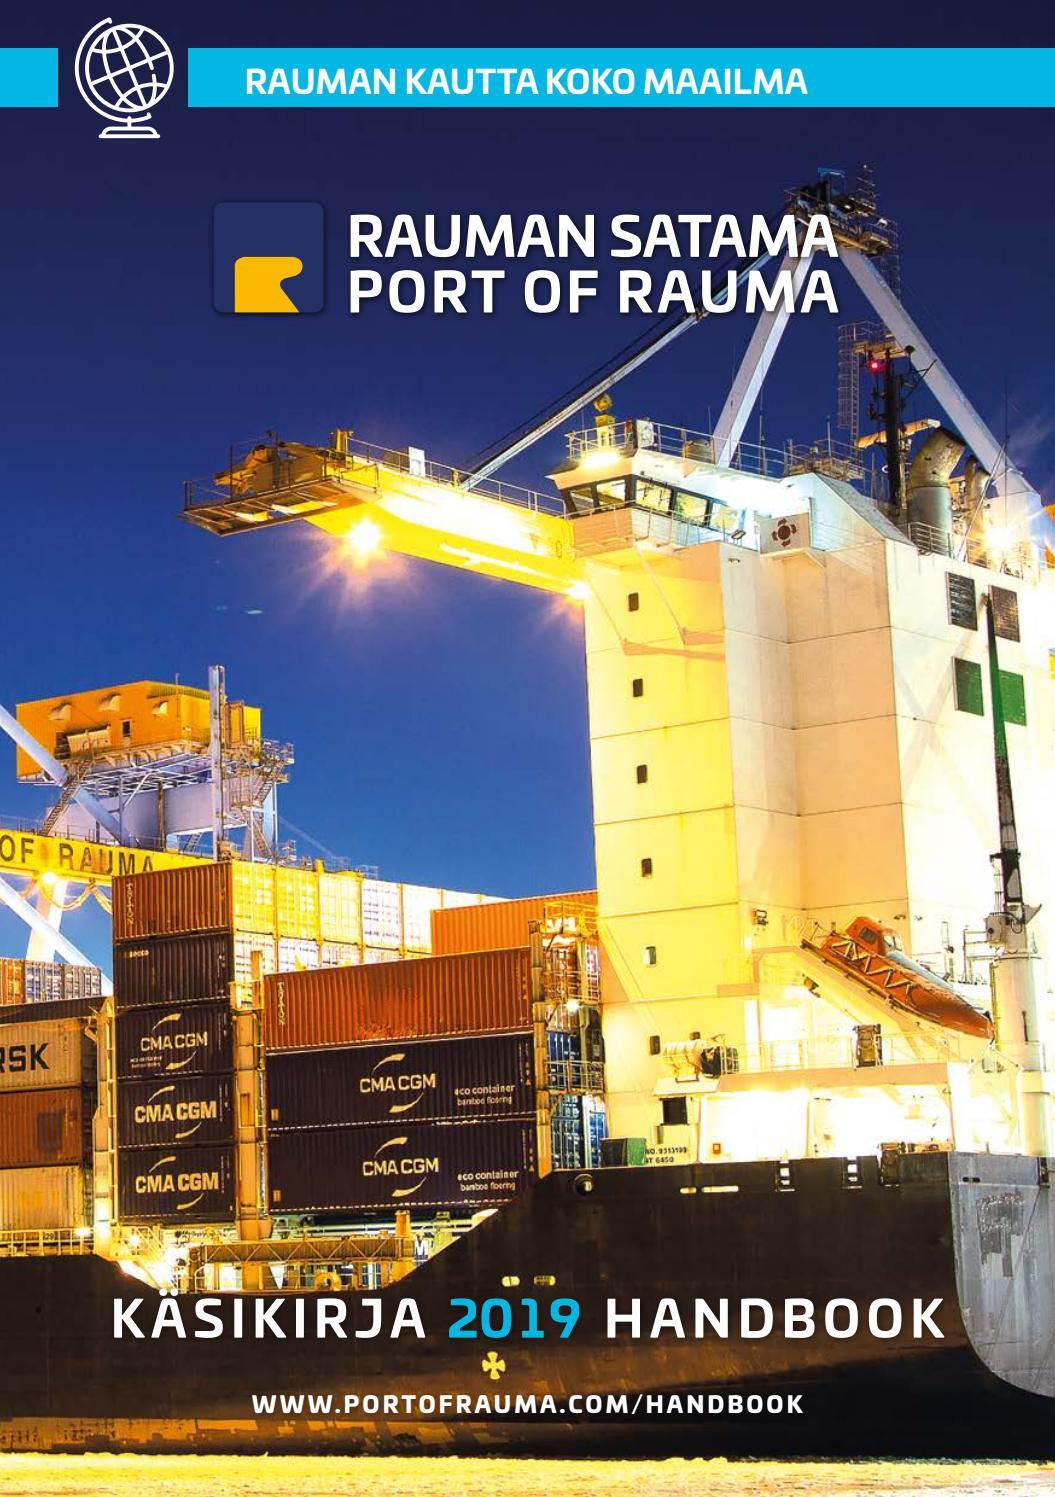 Rauman Satama Port Of Rauma Kasikirja Handbook By